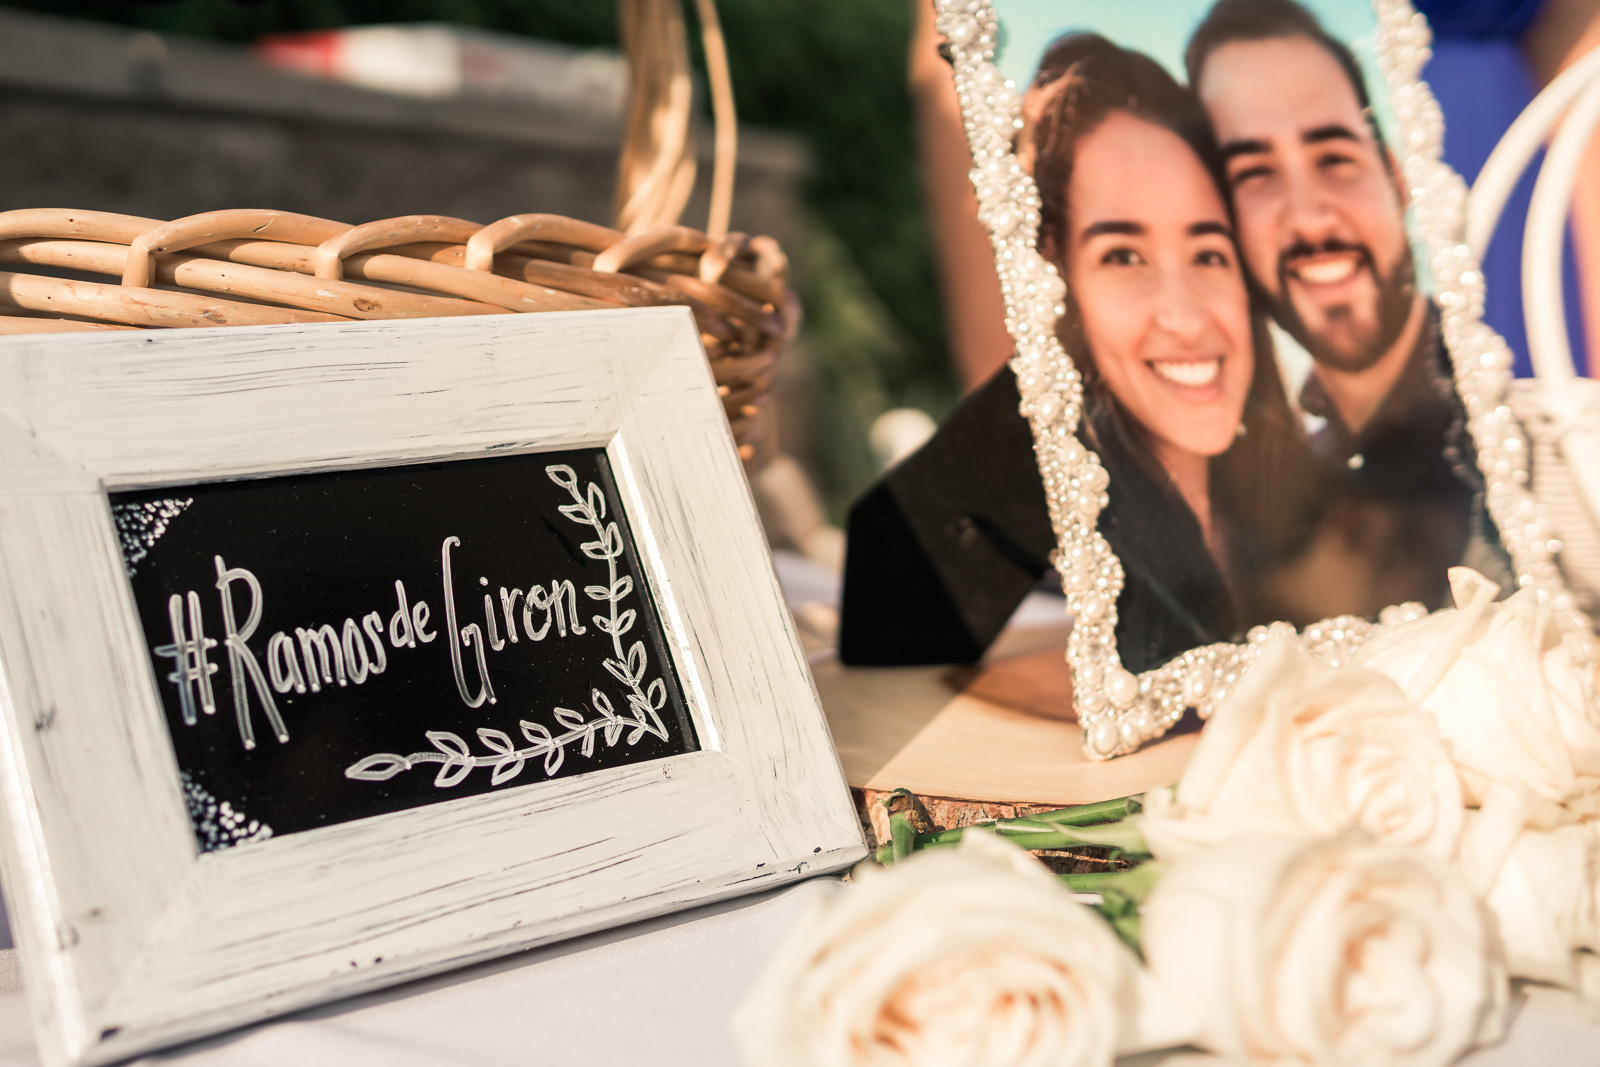 103_Angel-Brea-Orange-County_Joseph-Barber-Wedding-Photography.jpg